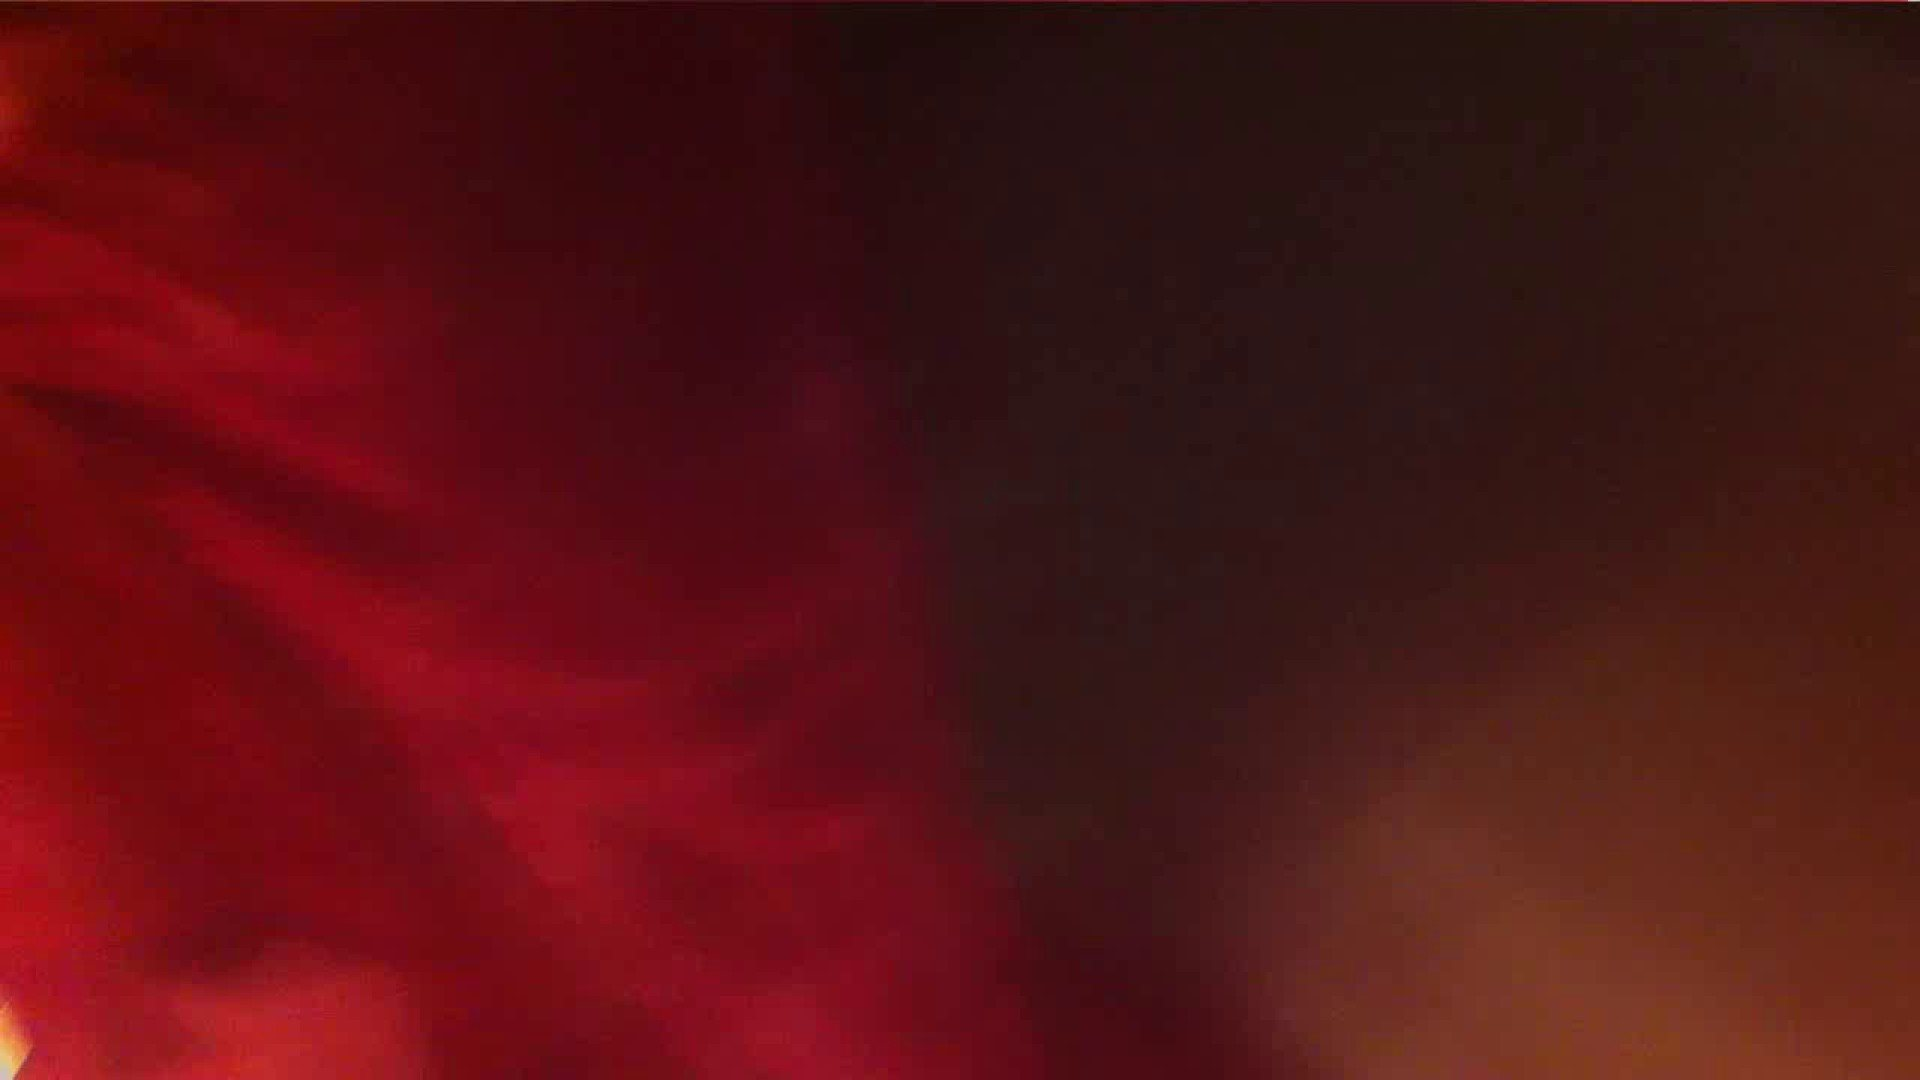 vol.36 美人アパレル胸チラ&パンチラ ポニテ(゚∀゚)キタコレ!! 美人 ぱこり動画紹介 41pic 3